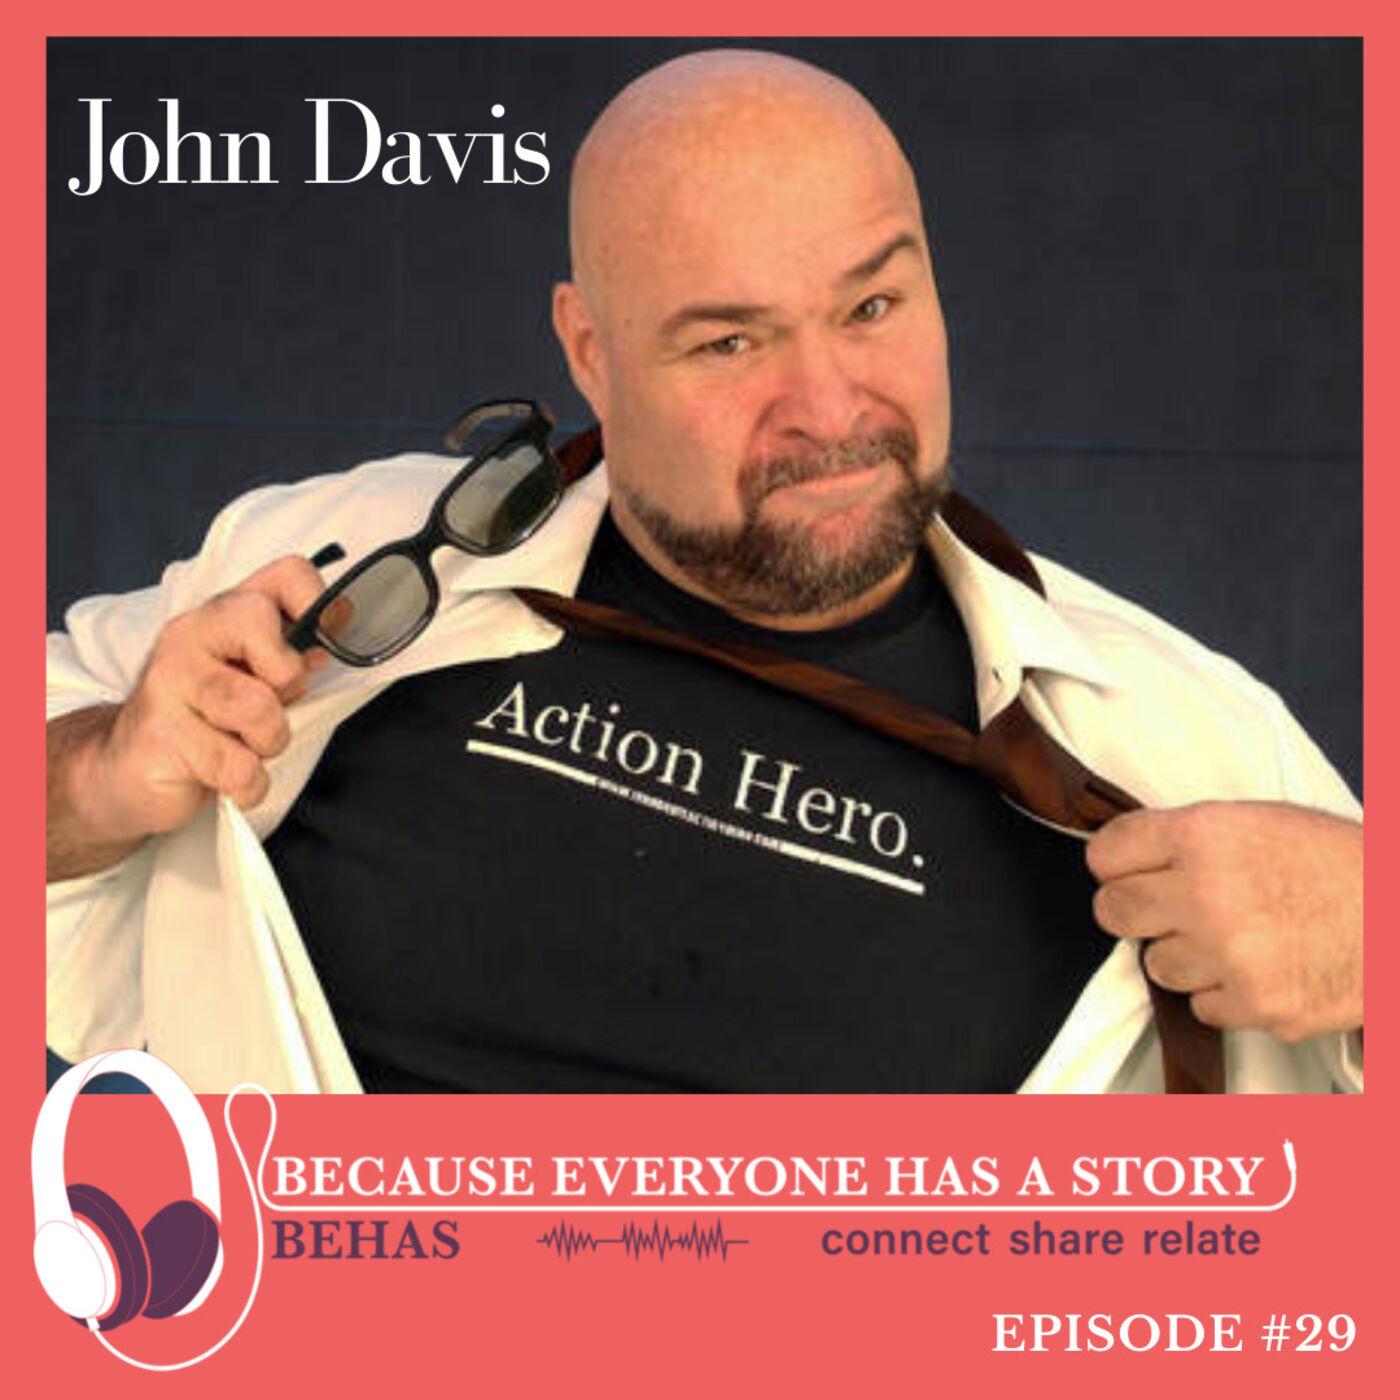 #29 A Corporate Action Hero - John Davis